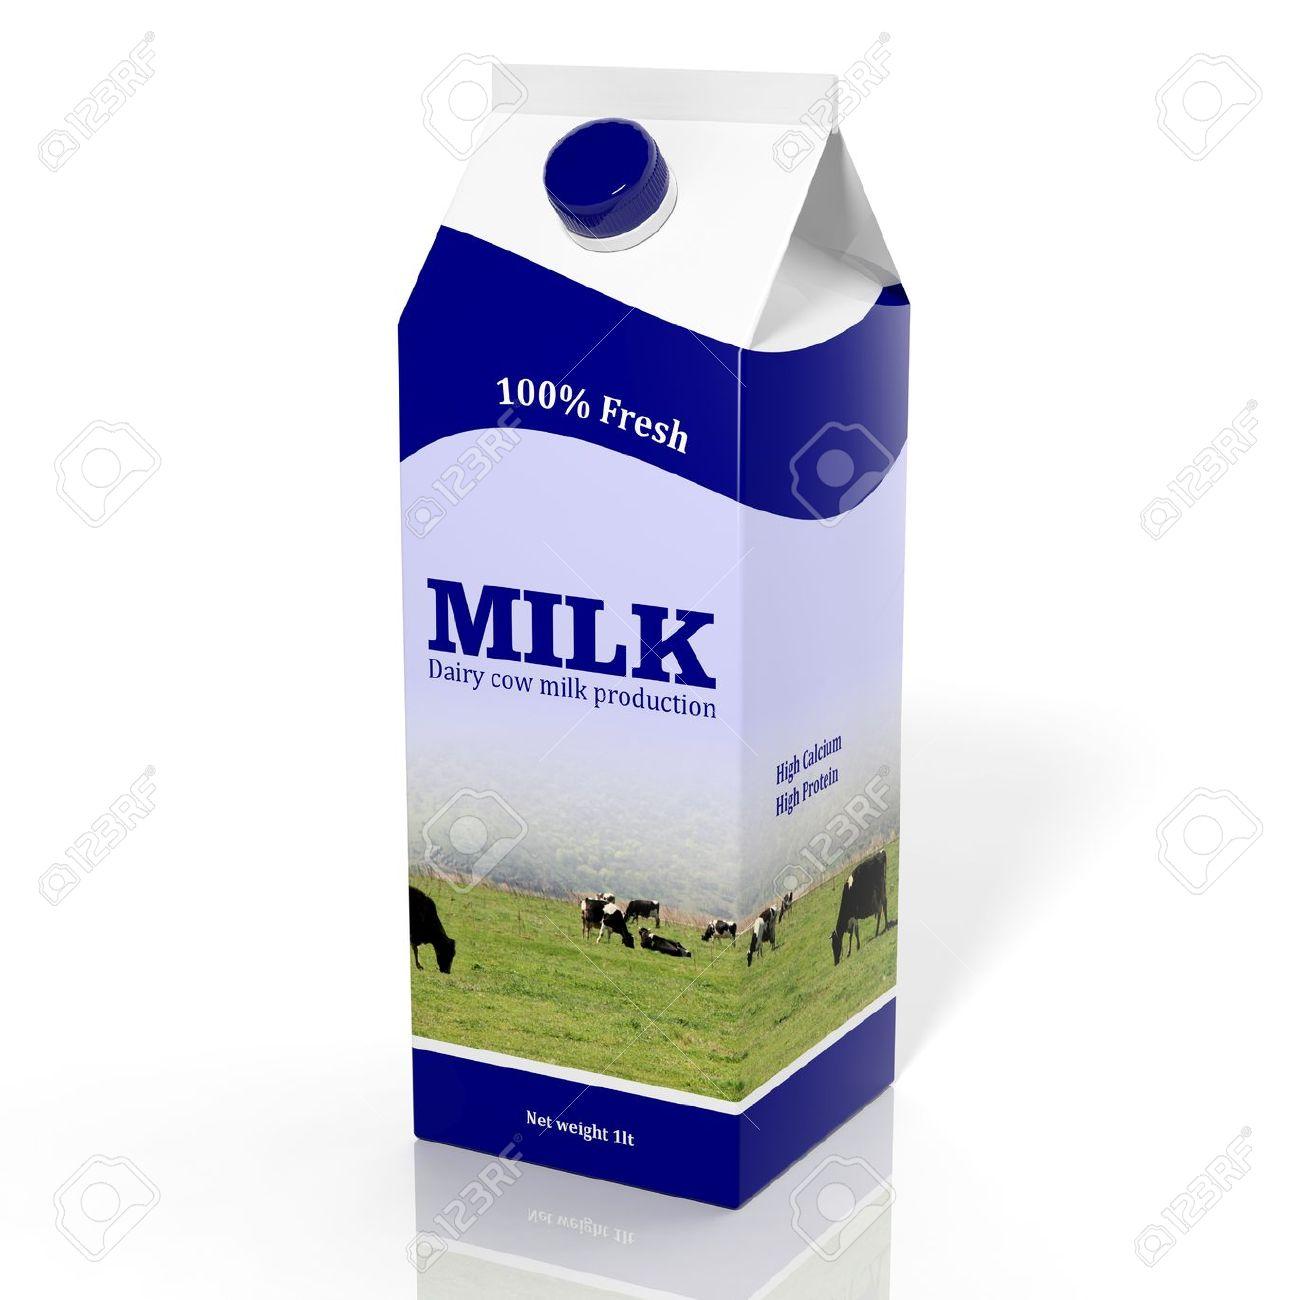 3D milk carton box isolated on white Stock Photo - 32955717